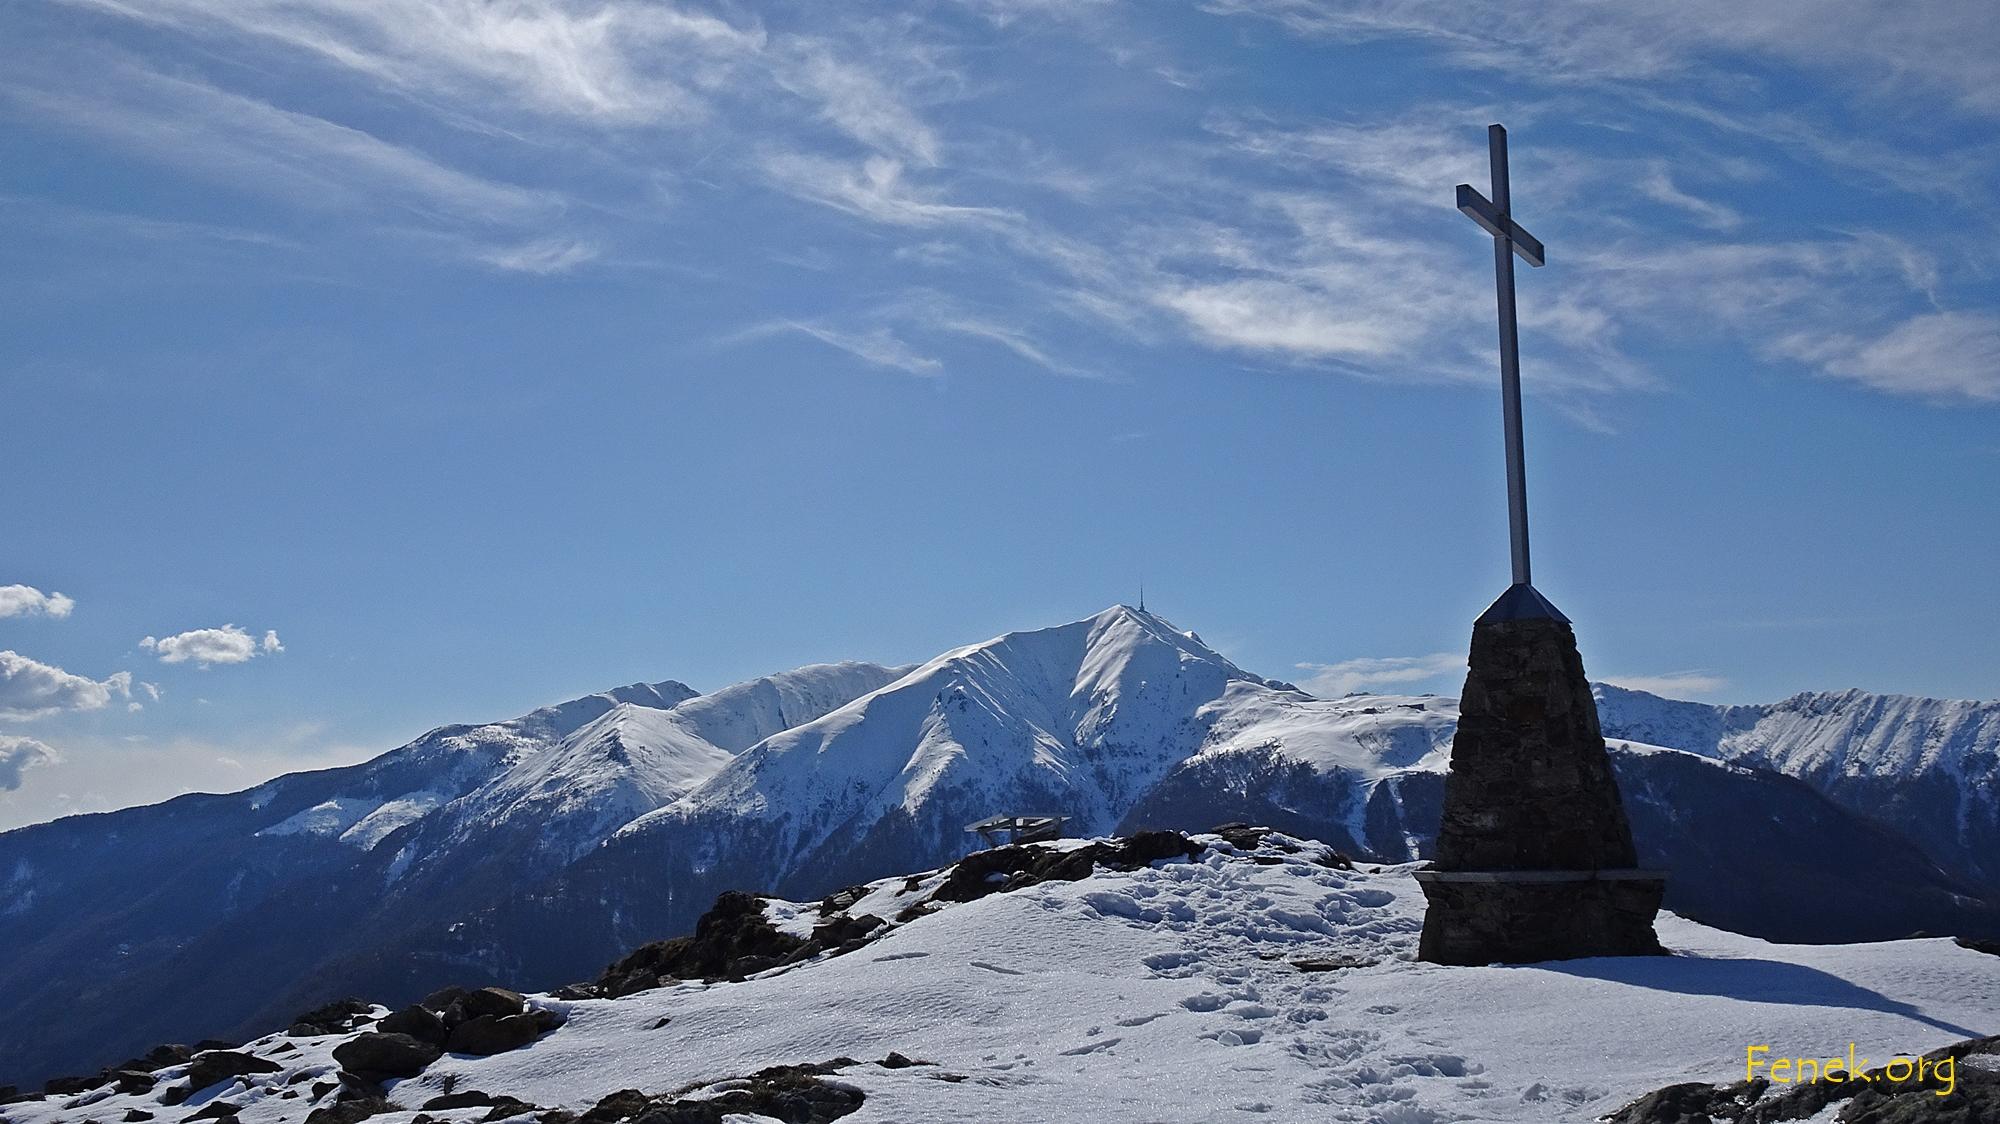 Wow - Monte Tamaro